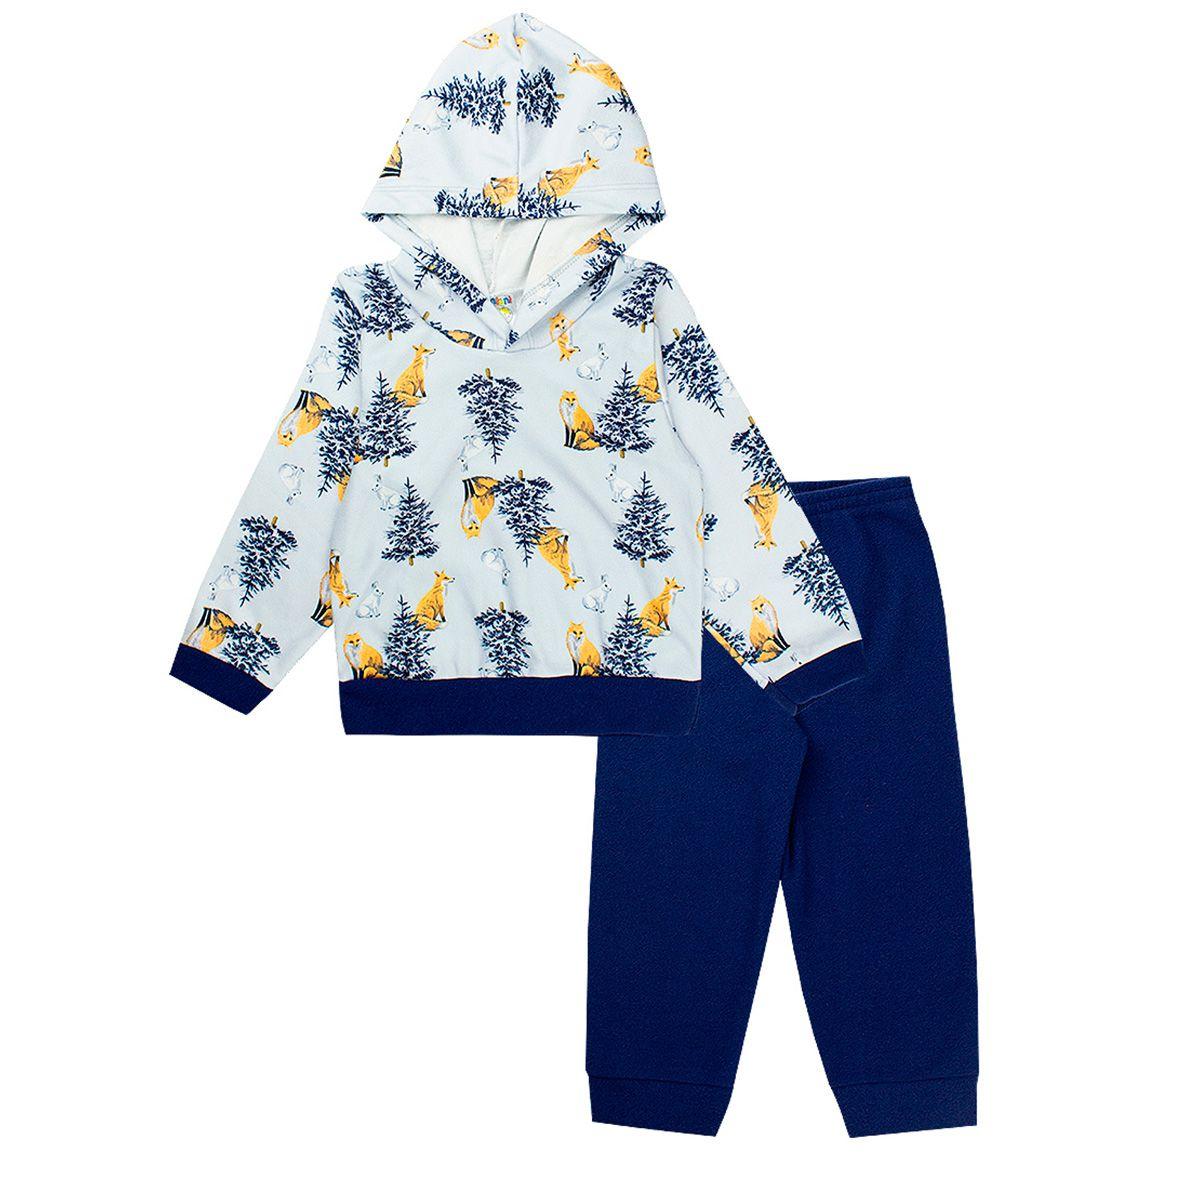 Conjunto Infantil Masculino Com Capuz Soft Azul - Fantoni